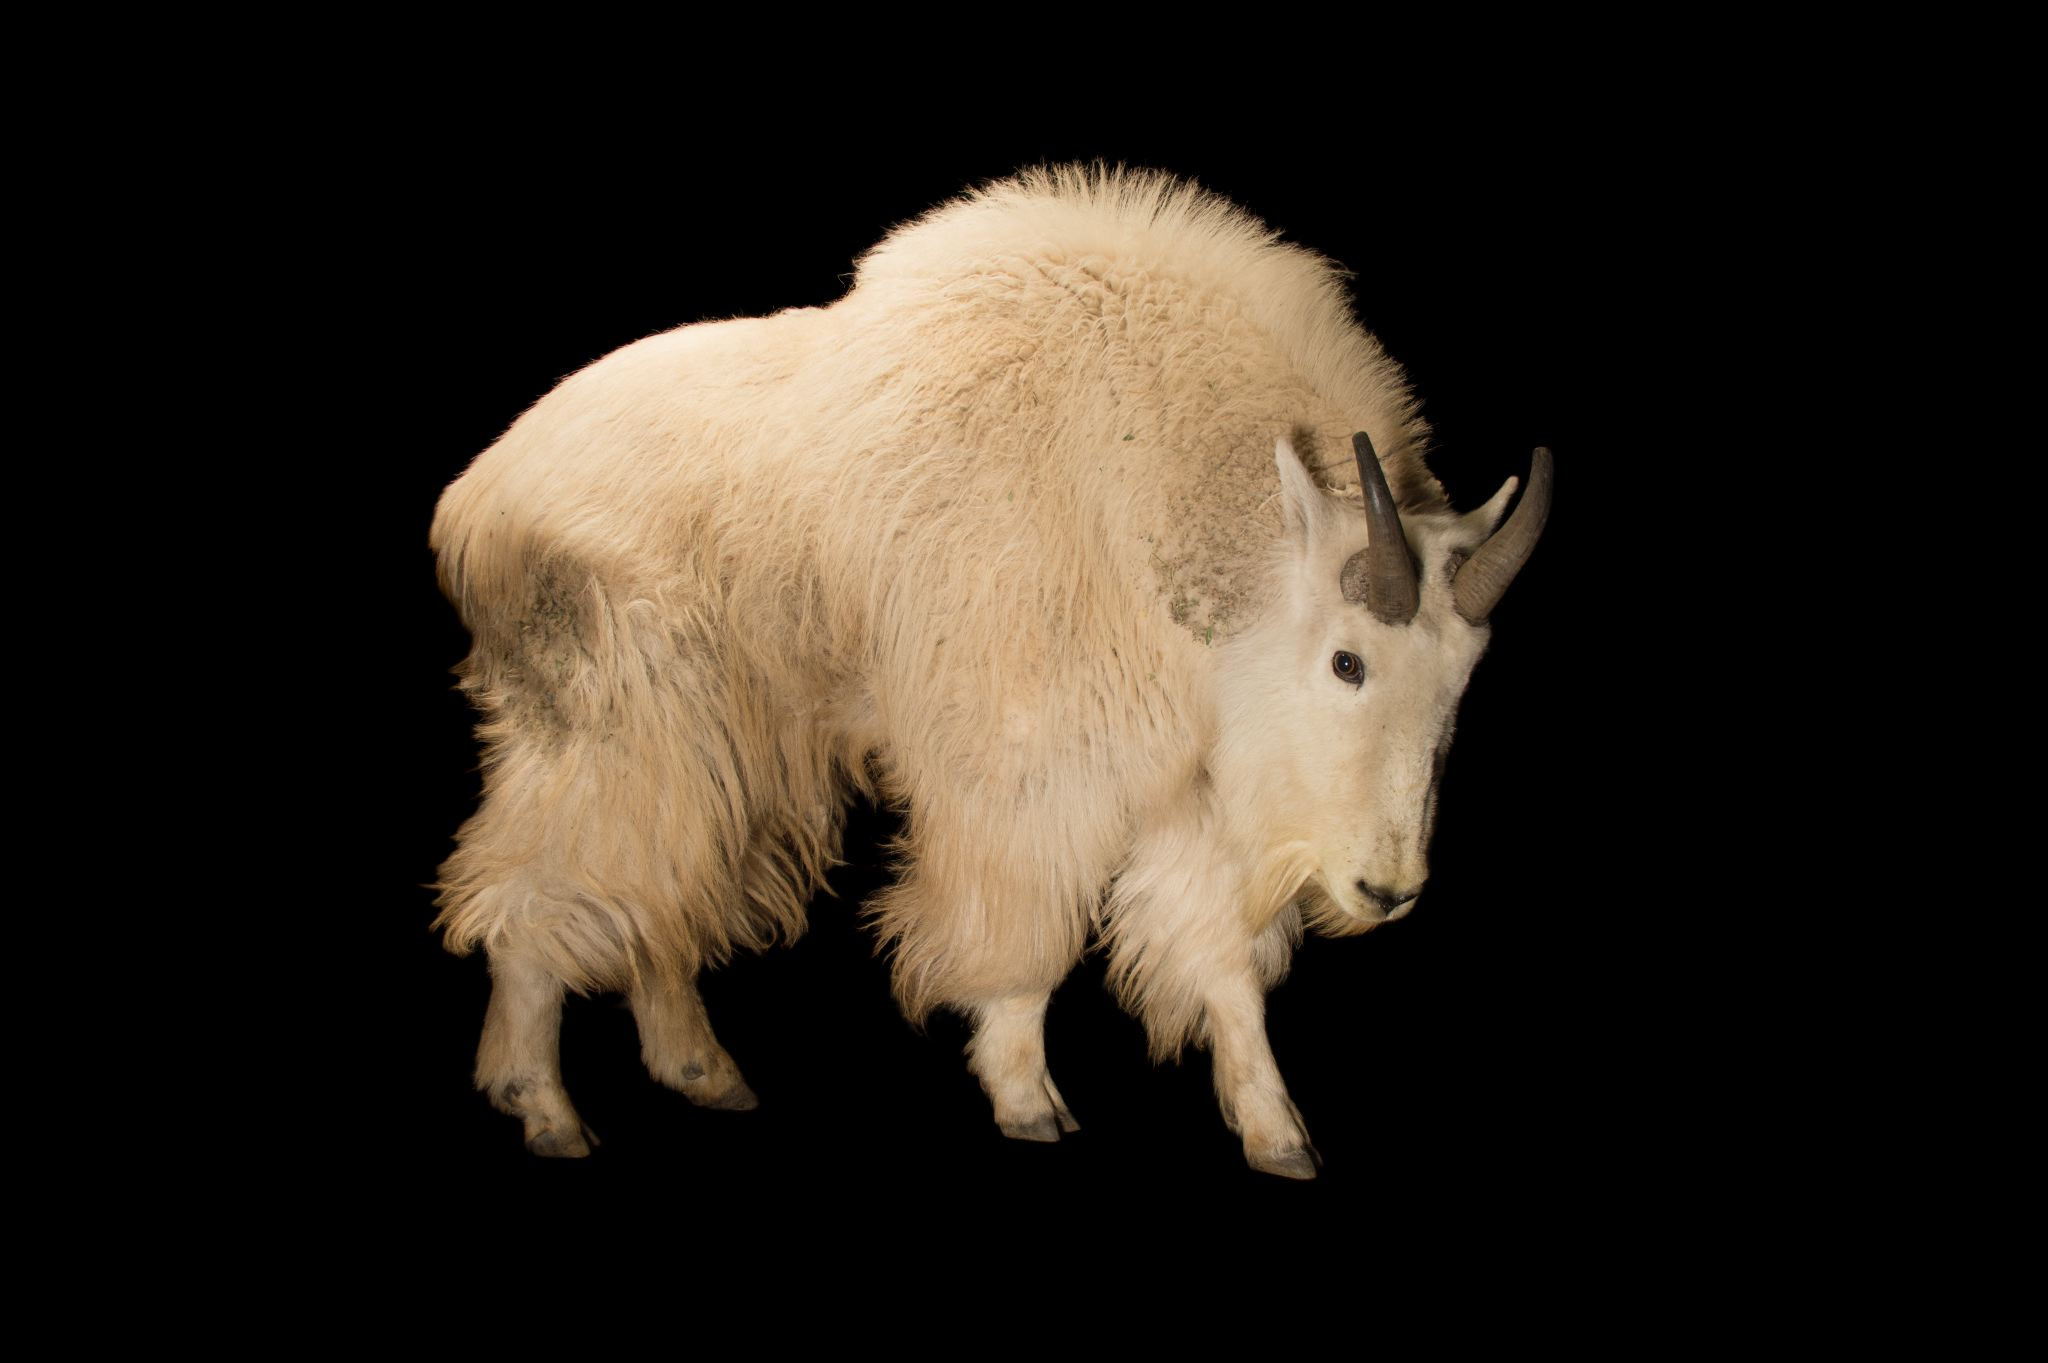 Goat Backgrounds, Compatible - PC, Mobile, Gadgets| 2048x1363 px